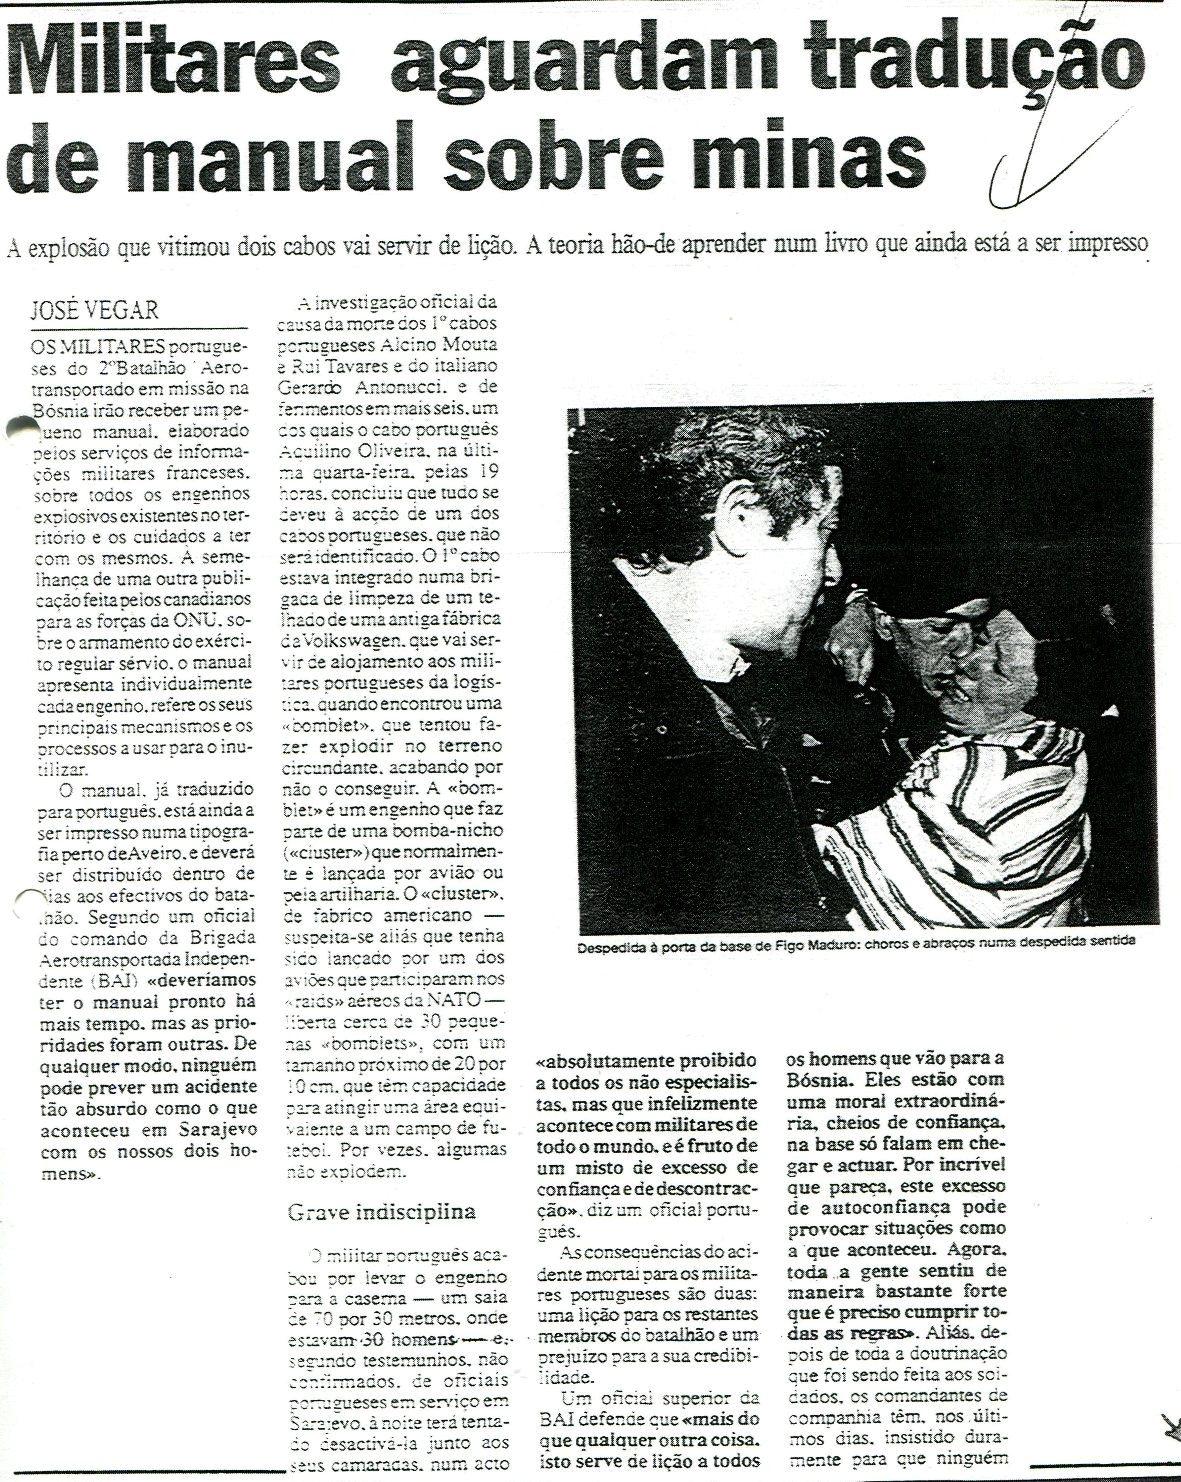 27JAN96 - Expresso